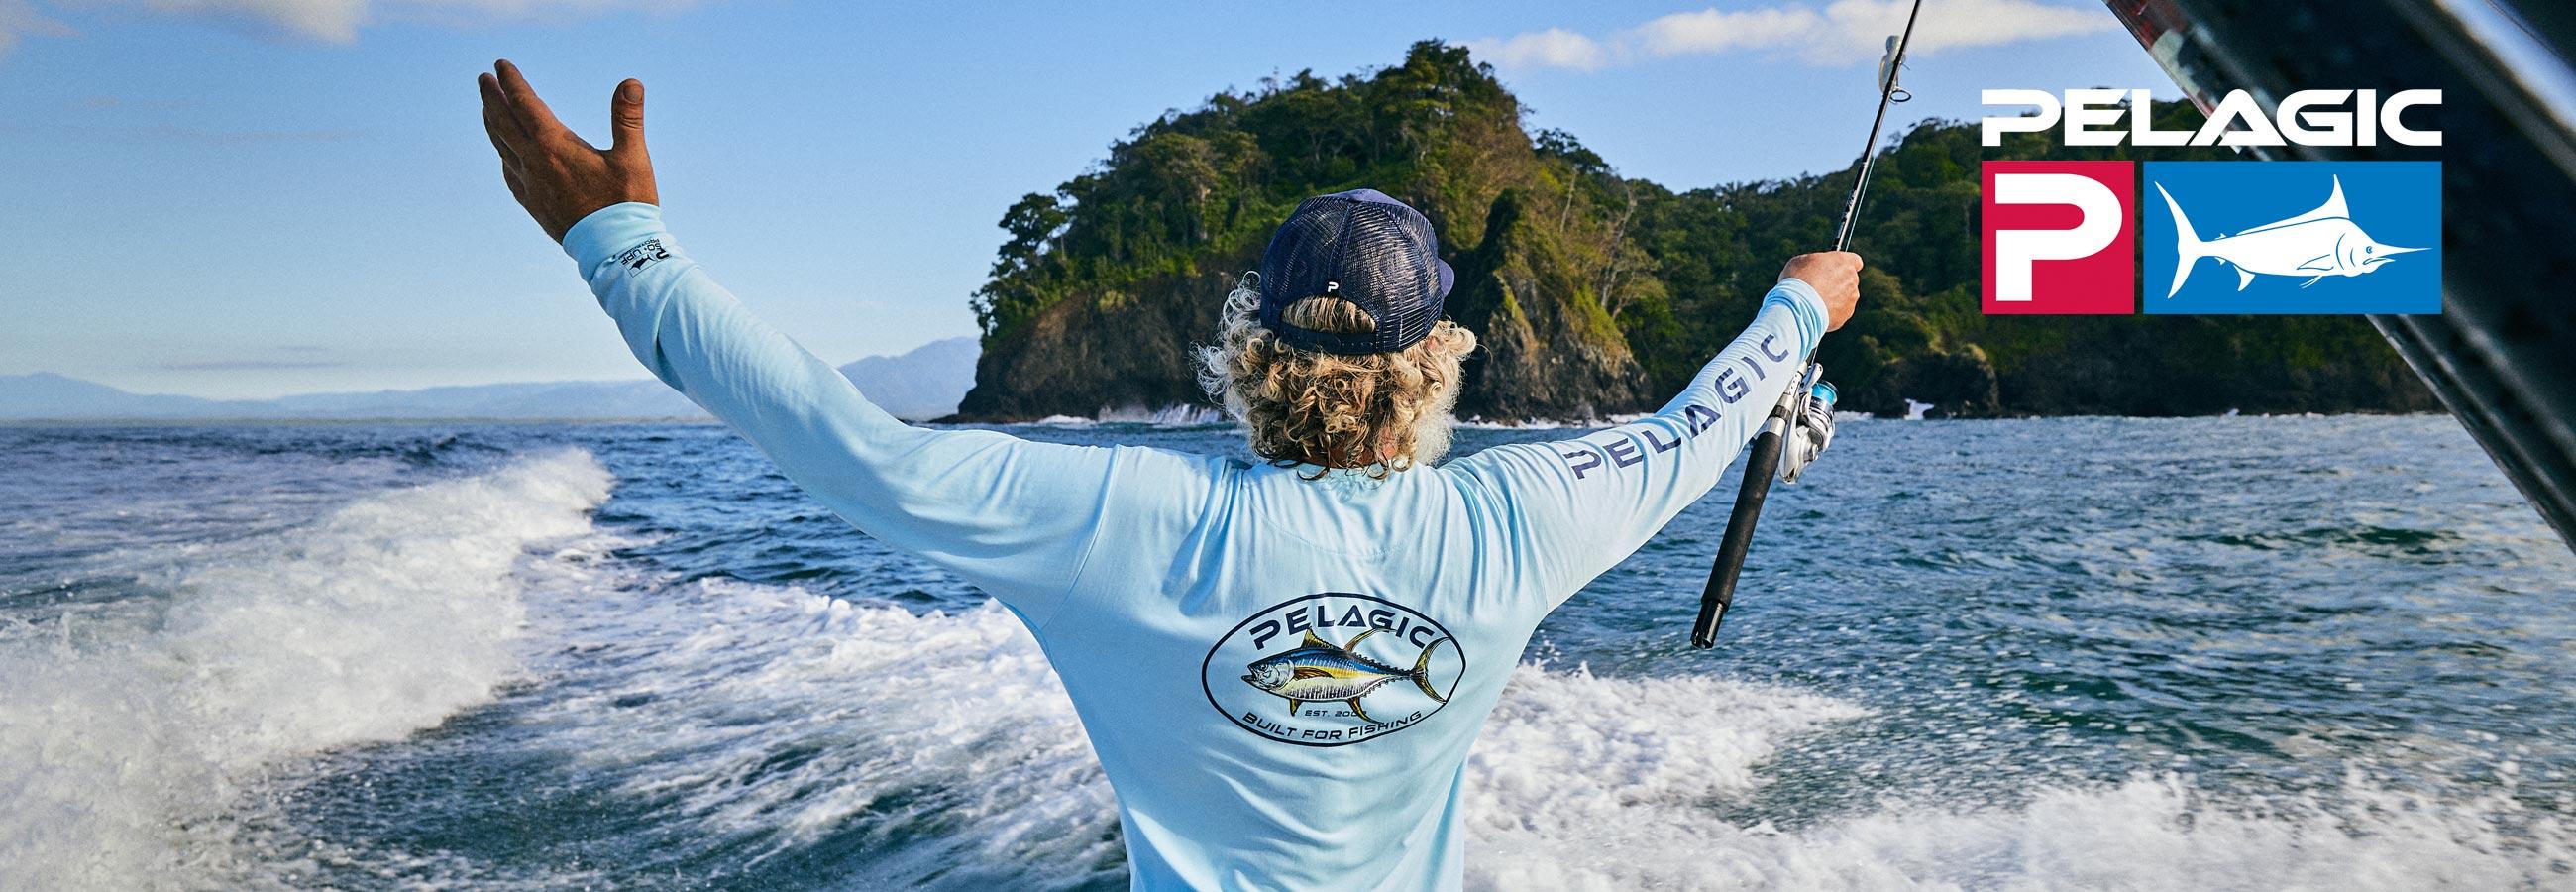 PELAGIC High Performance Fishing Gear